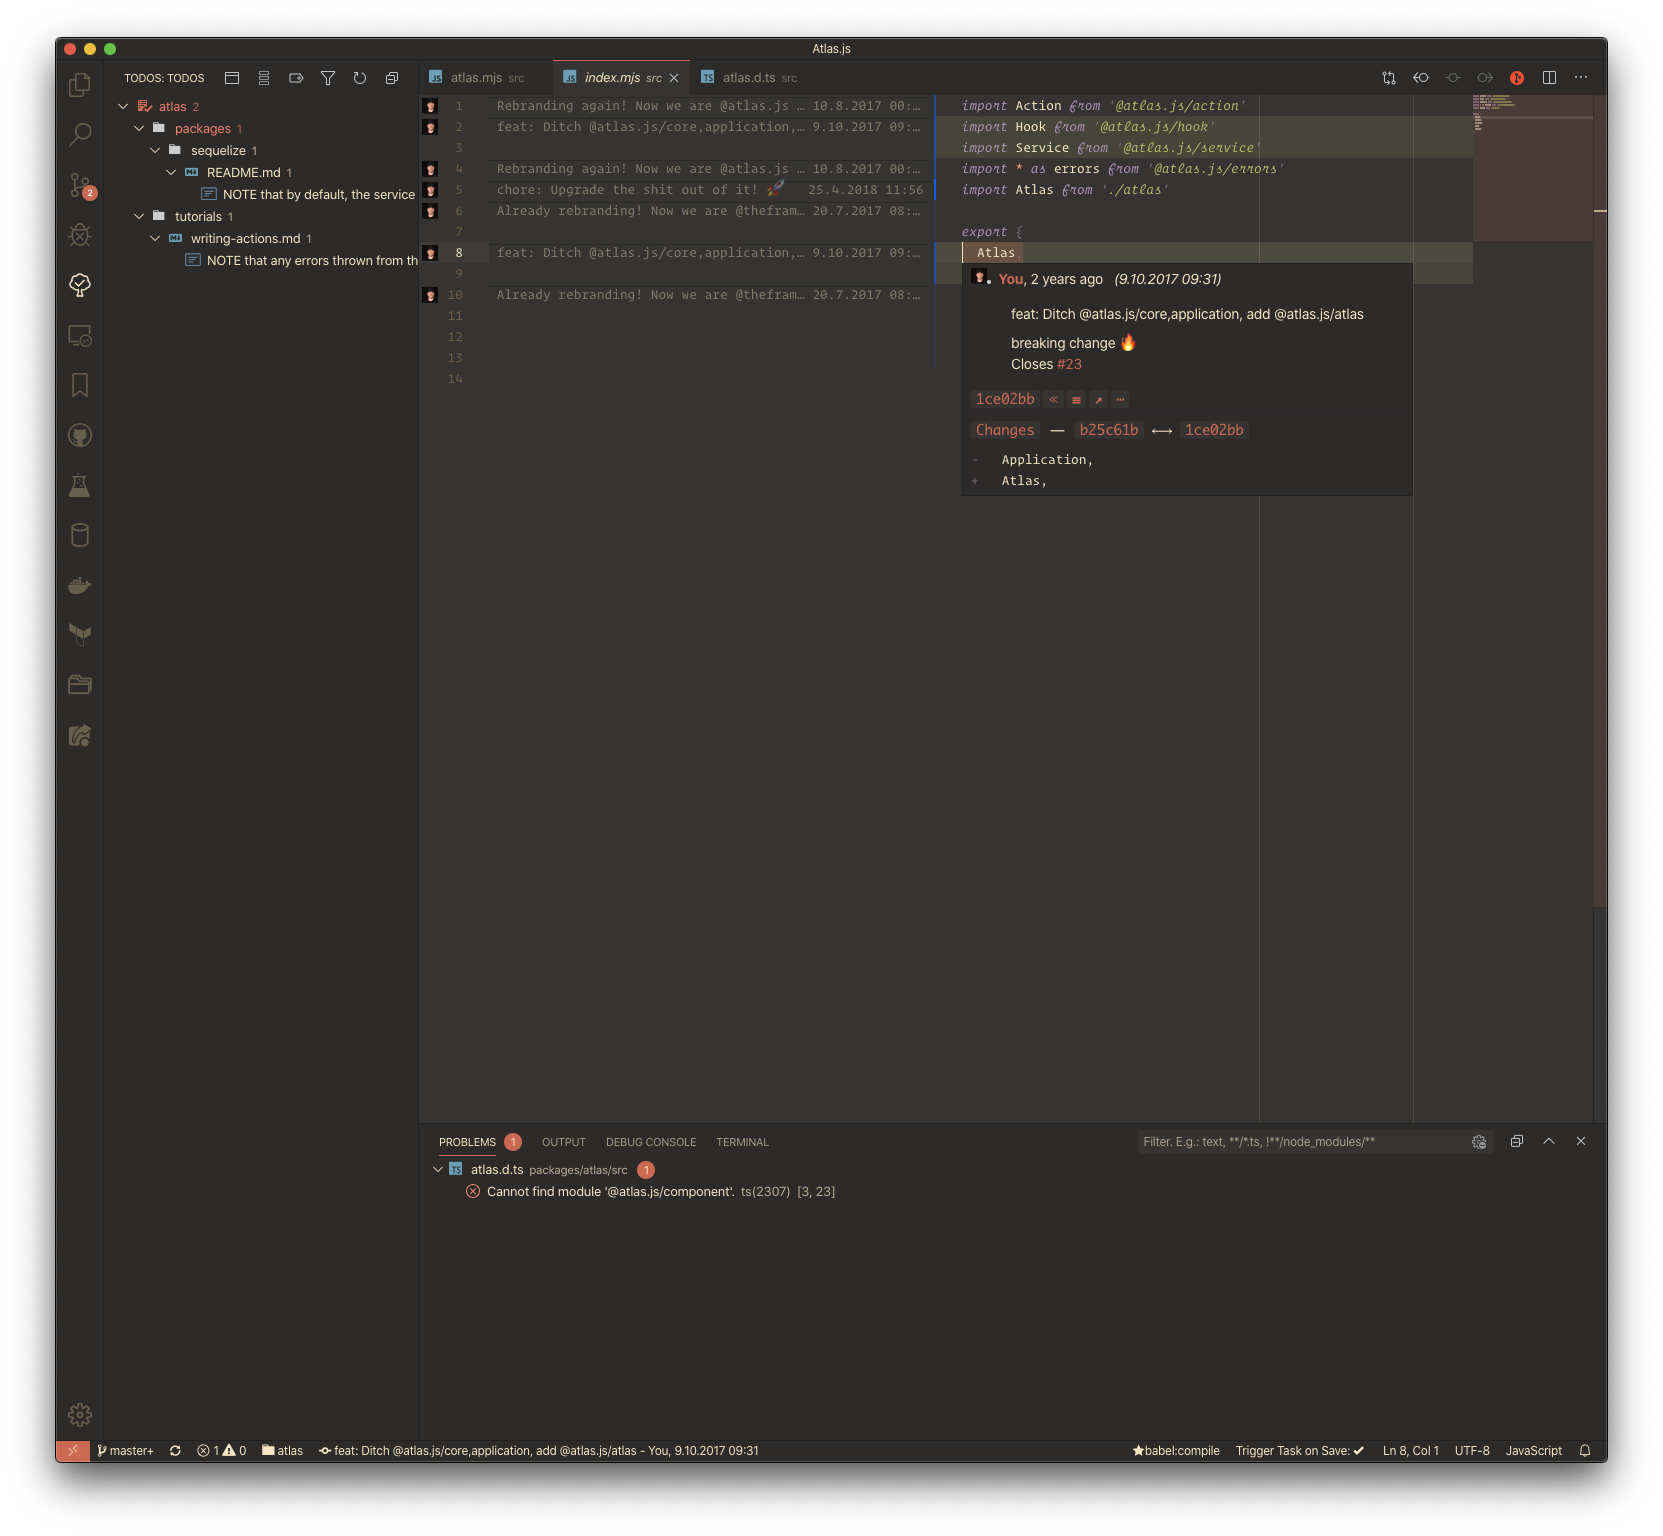 GitLens